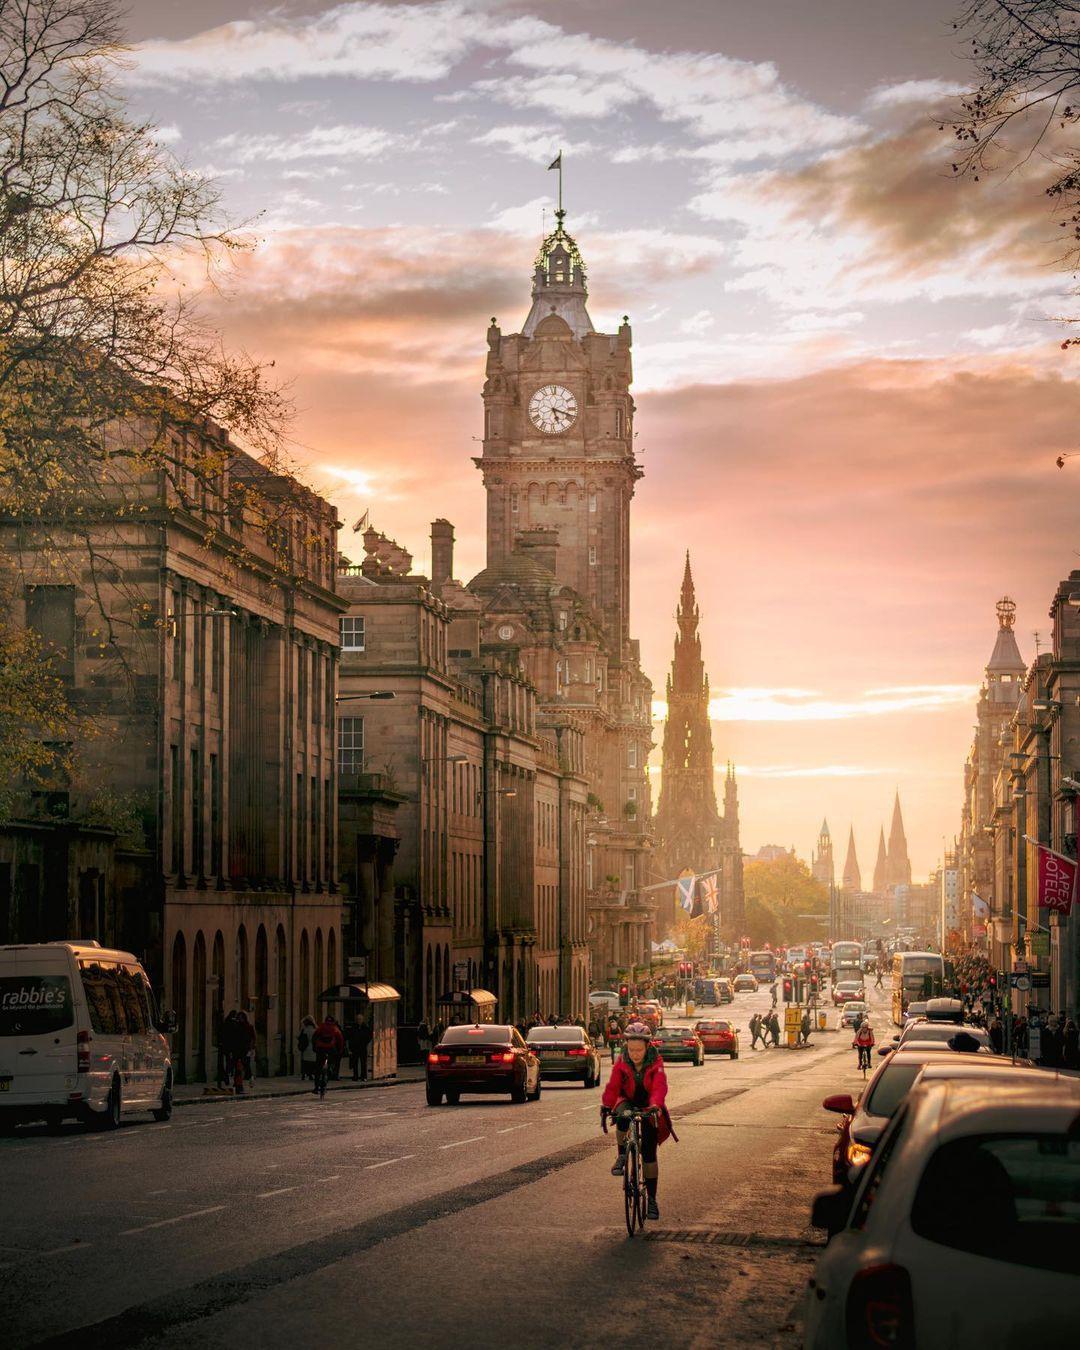 "John Murray - Scotland on Instagram: ""The city of #Edinburgh at 5:18pm minus 3 minutes 🙂🏴💕 .. .. #scotlandisnow #ig_edinburgh #BalmoralMoments #thisisedinburgh…"""